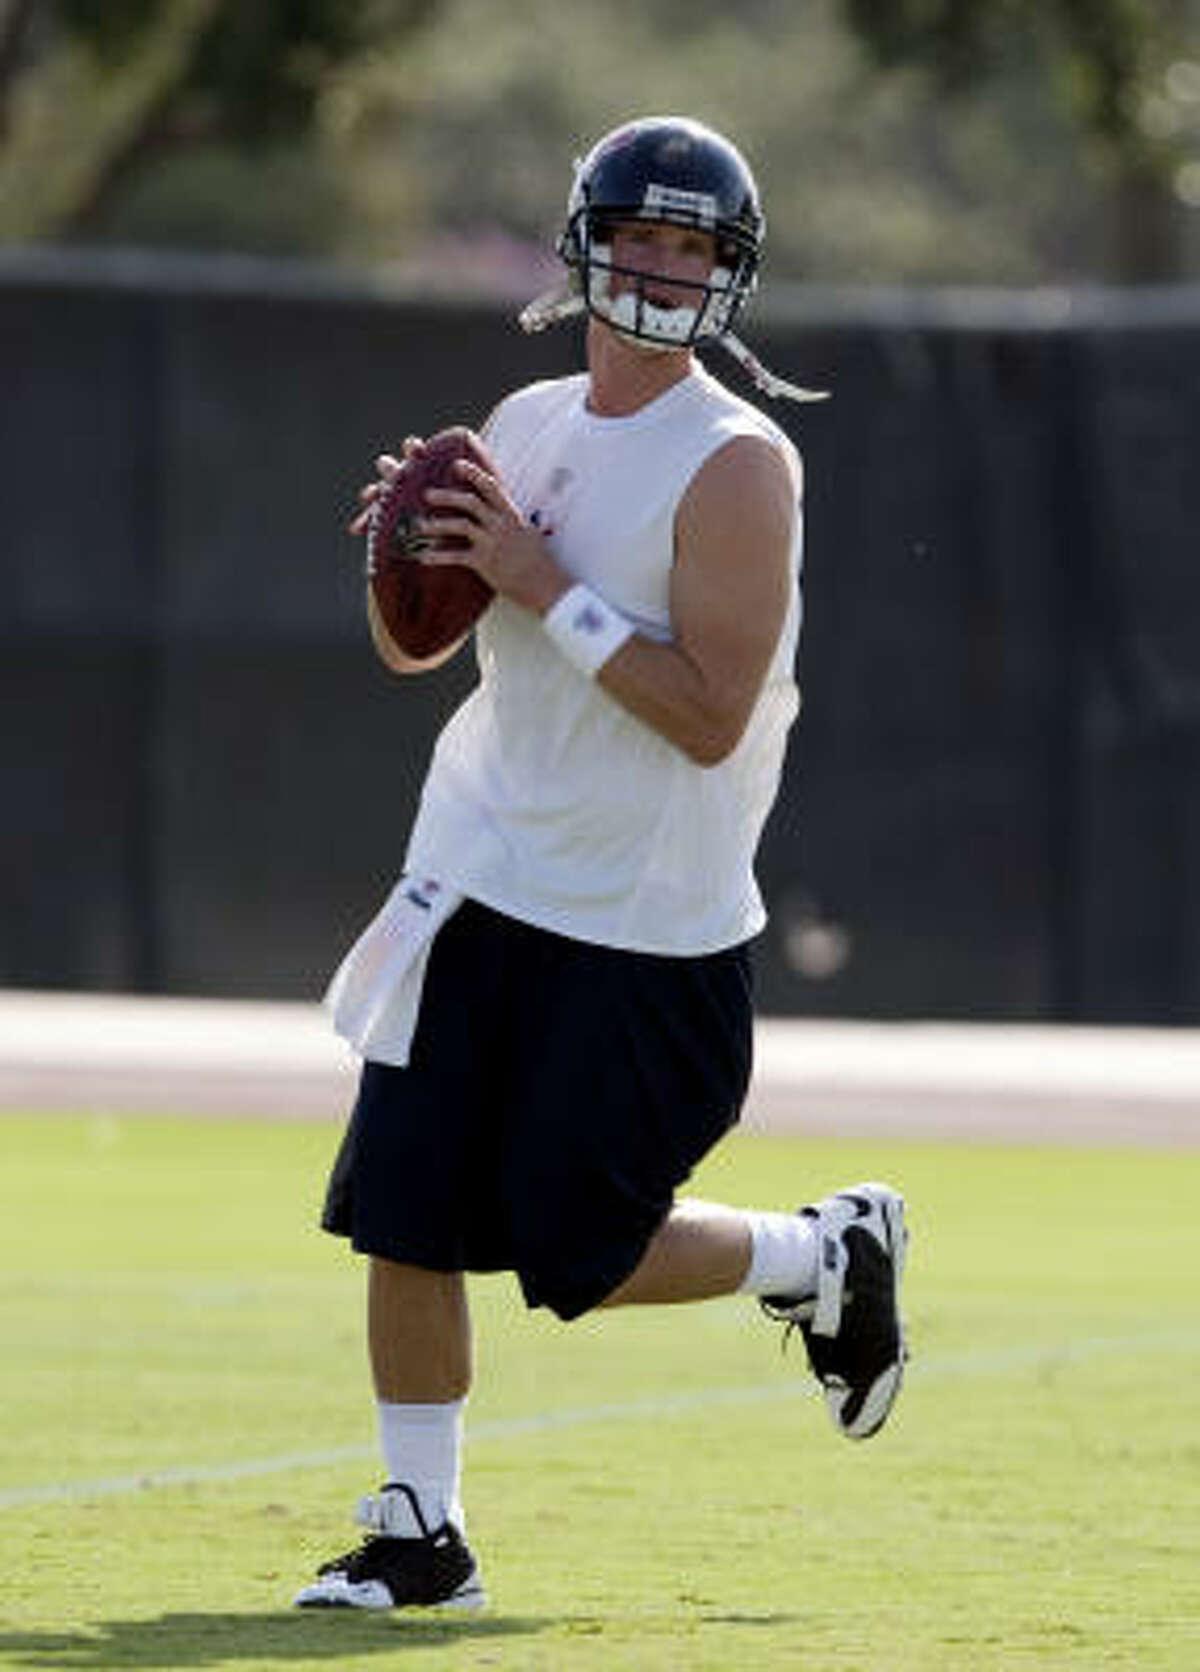 Quarterback Alex Brink runs through drills during Texans' football practice.